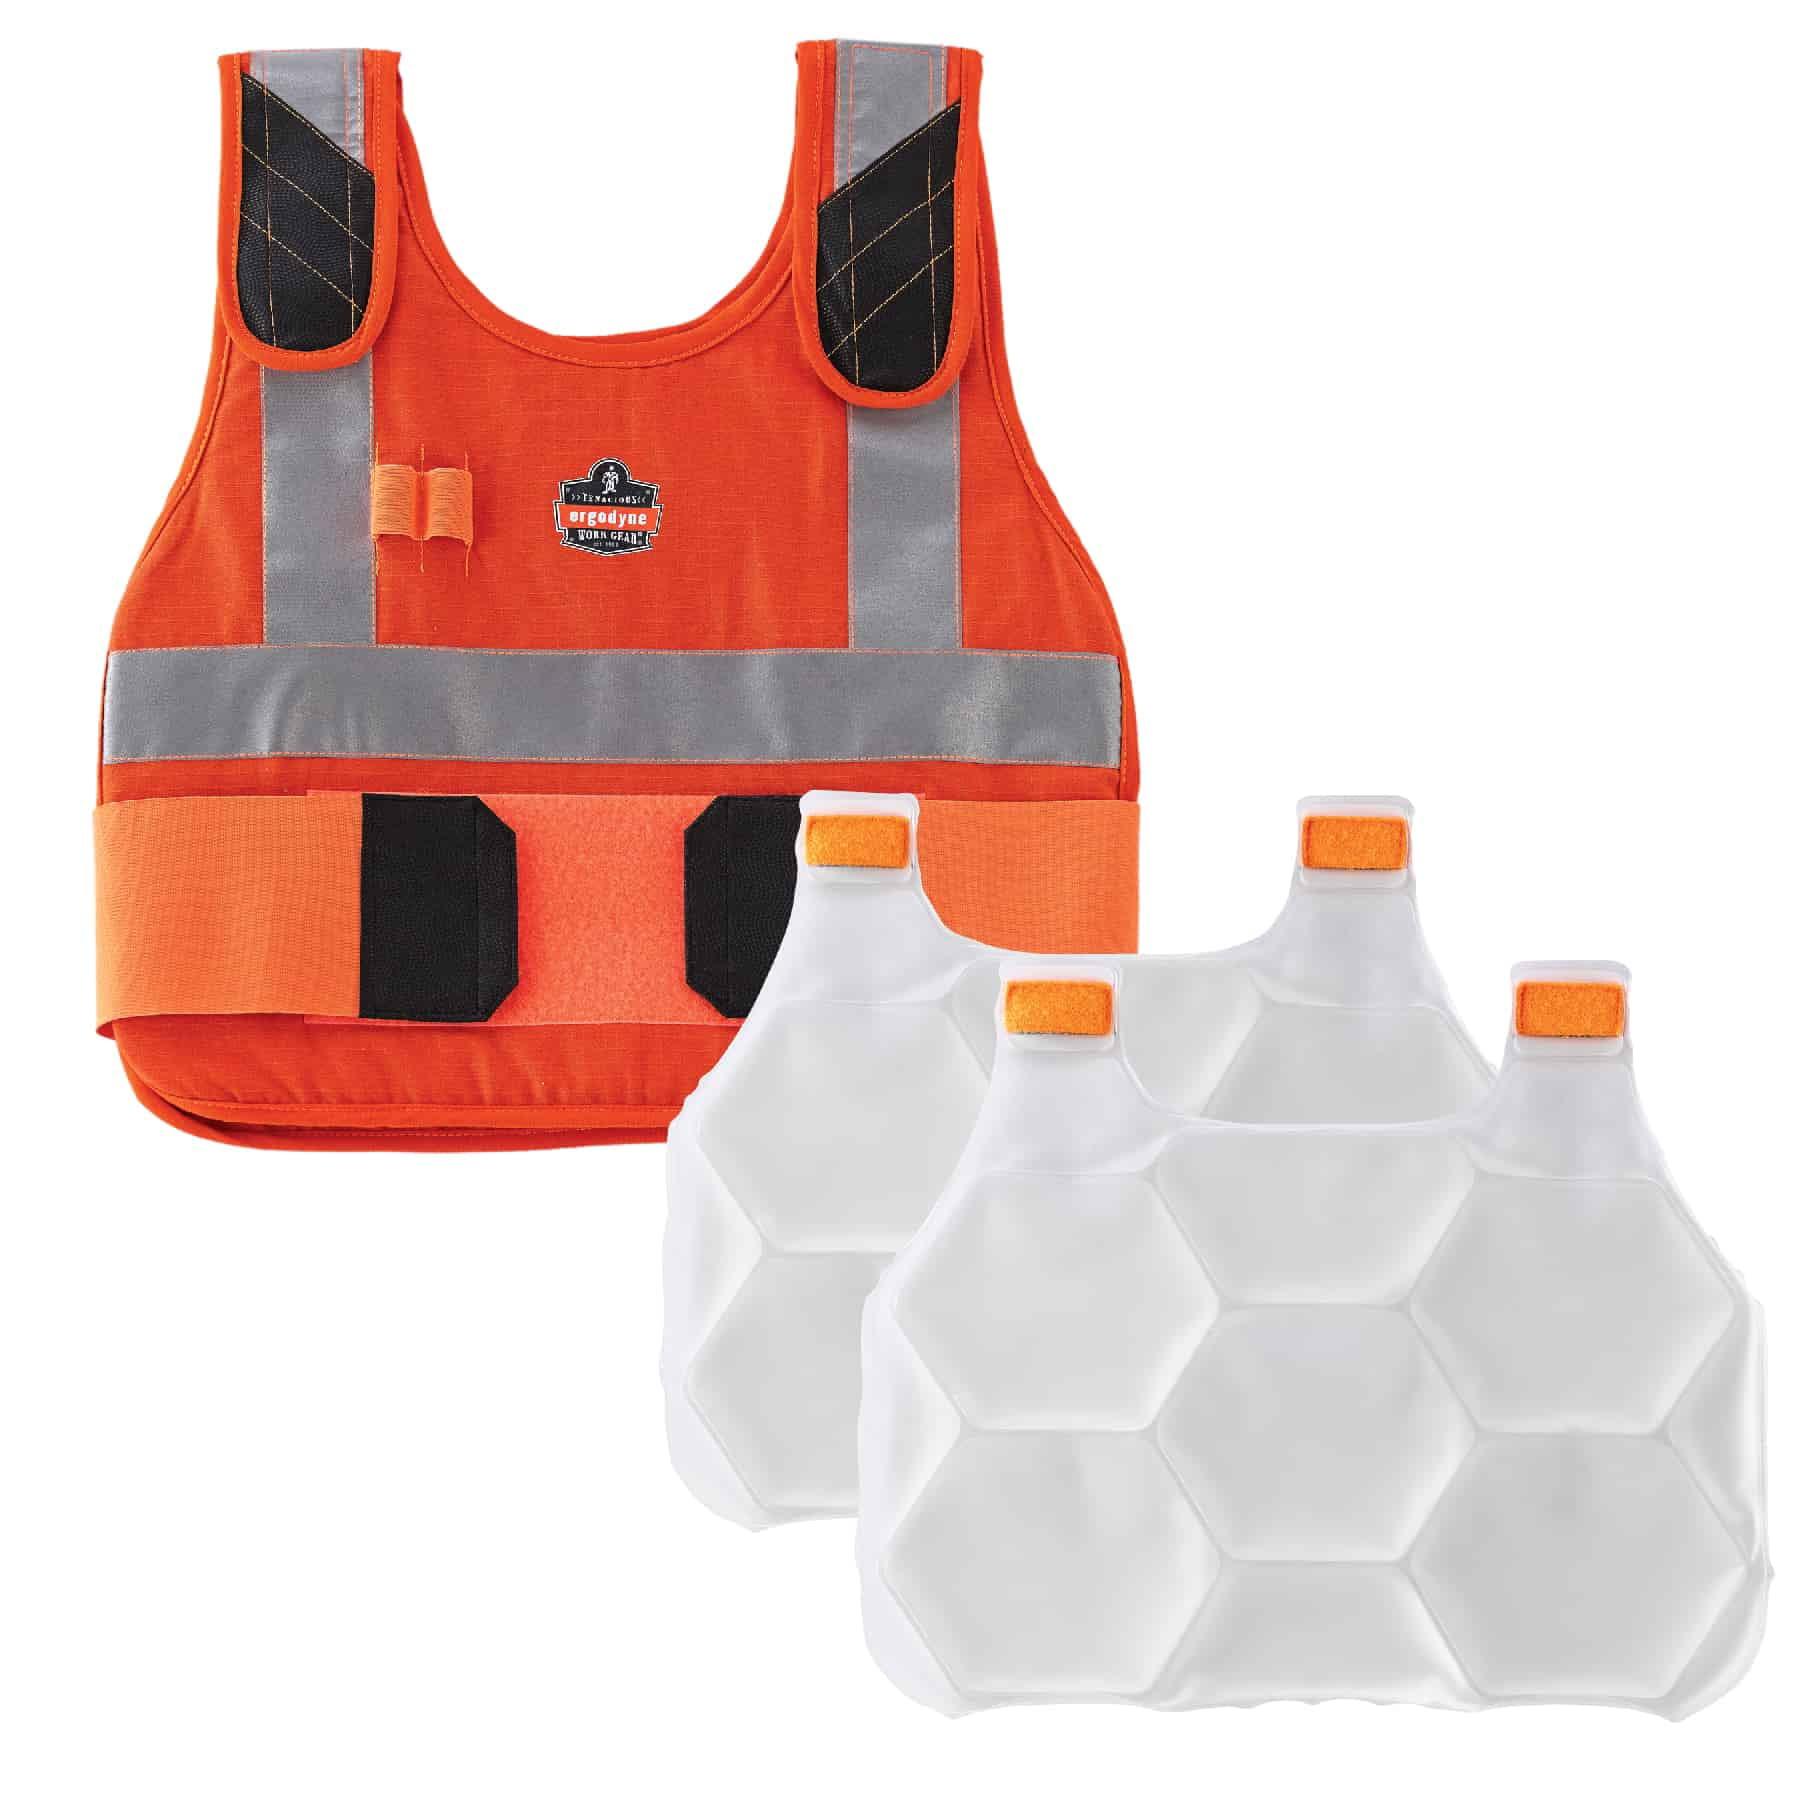 Ergodyne Chill-Its® 6215 Premium FR Phase Change Cooling Vest with Packs, Orange, L/XL